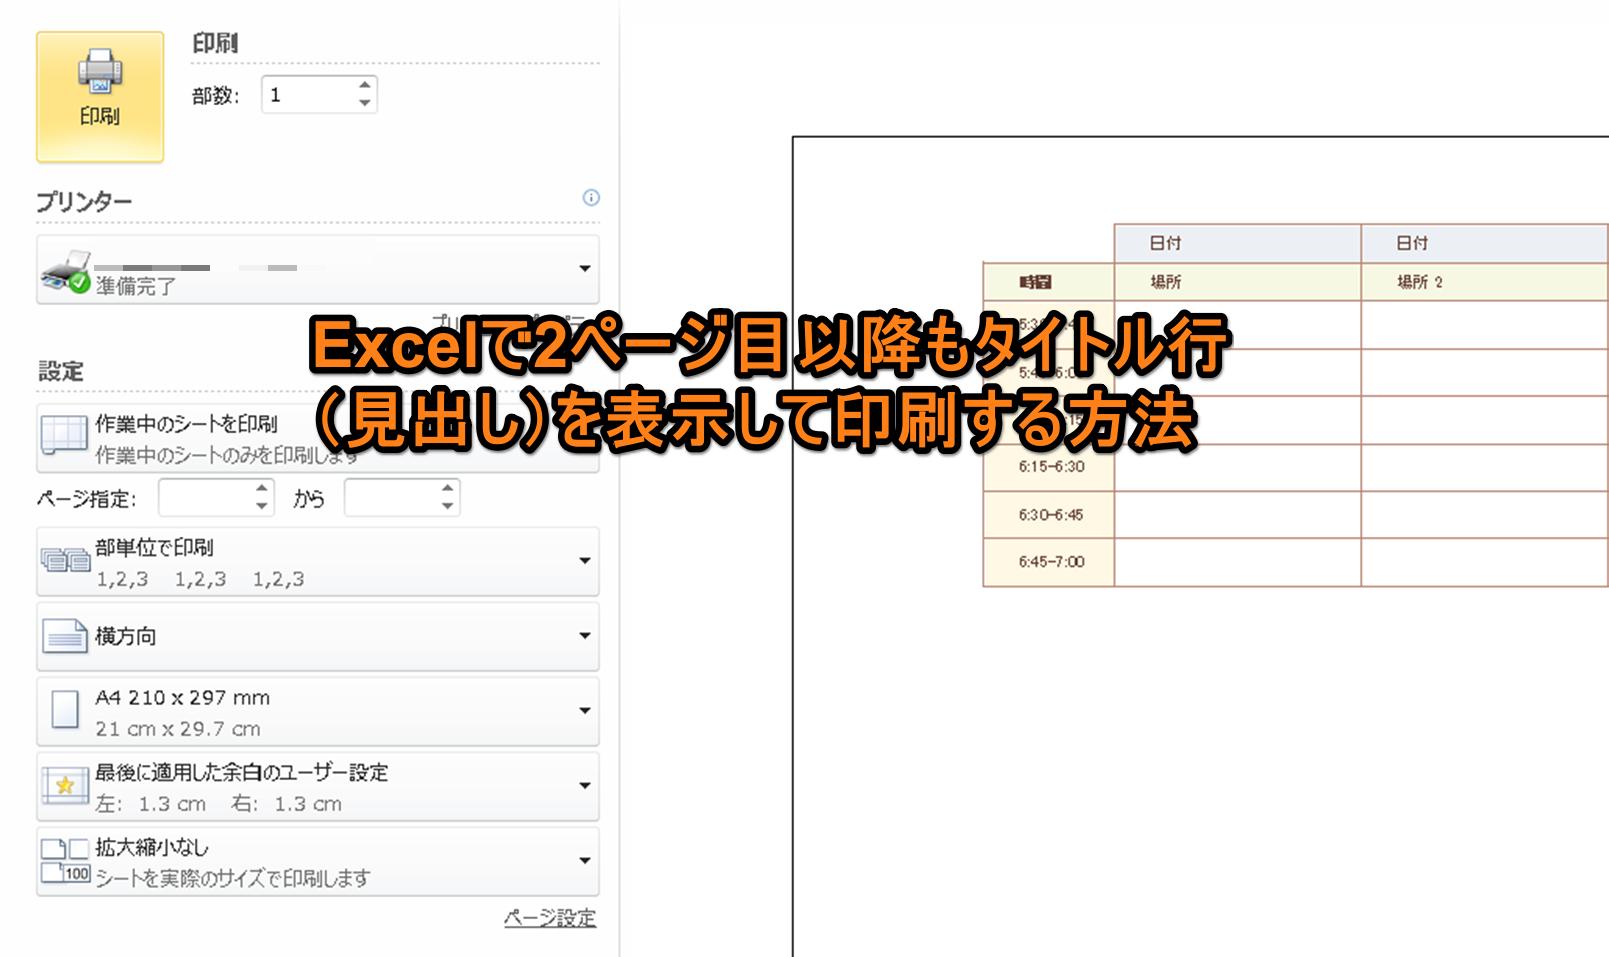 Excelで2ページ目以降もタイトル行(見出し)を表示して印刷する方法